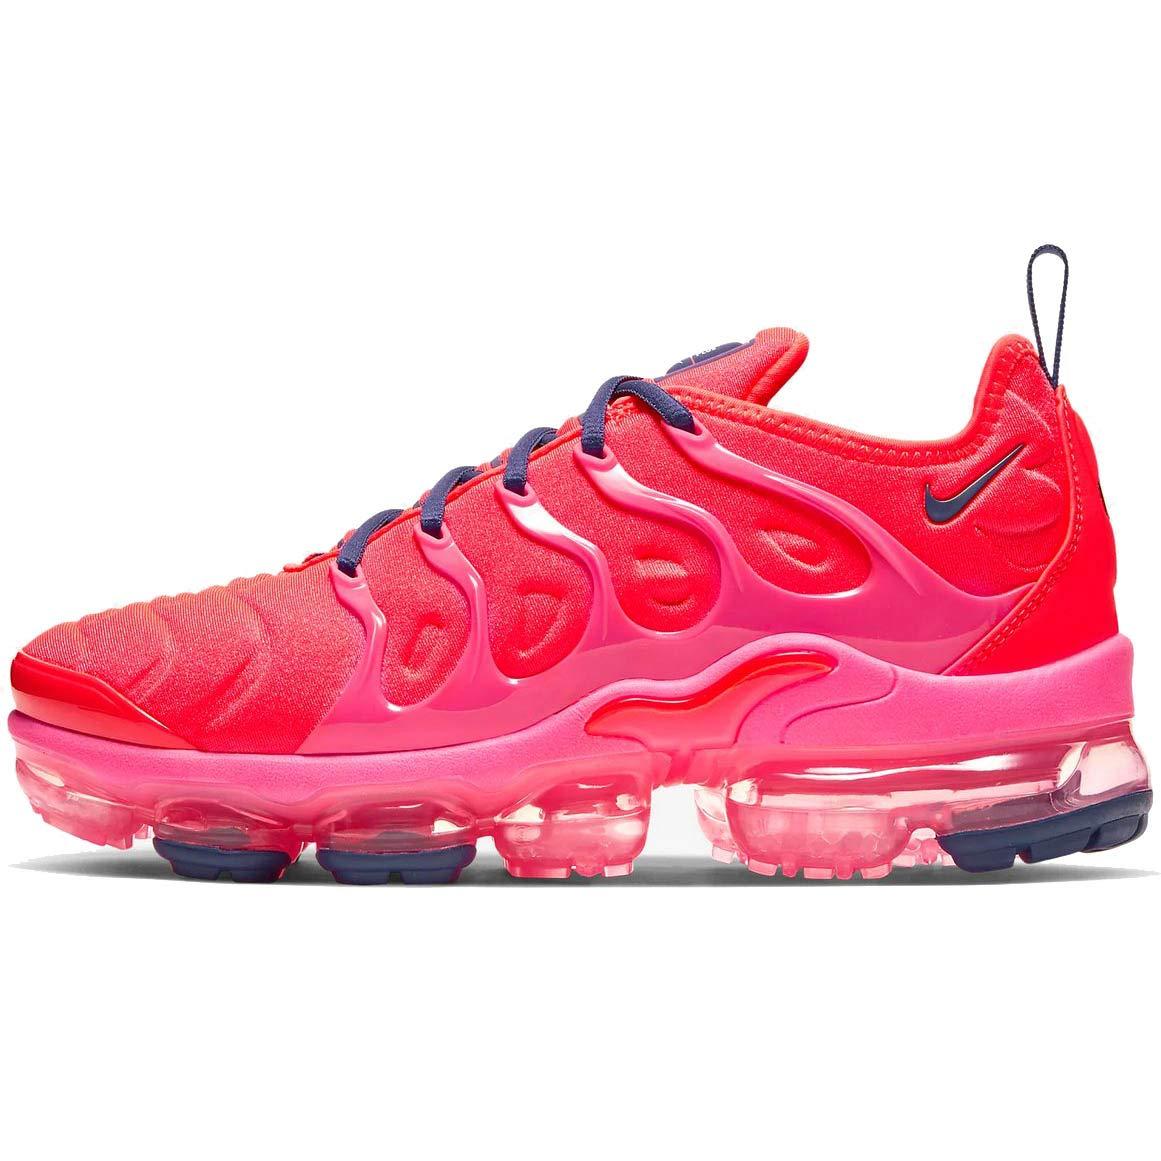 nike vapormax plus women's pink